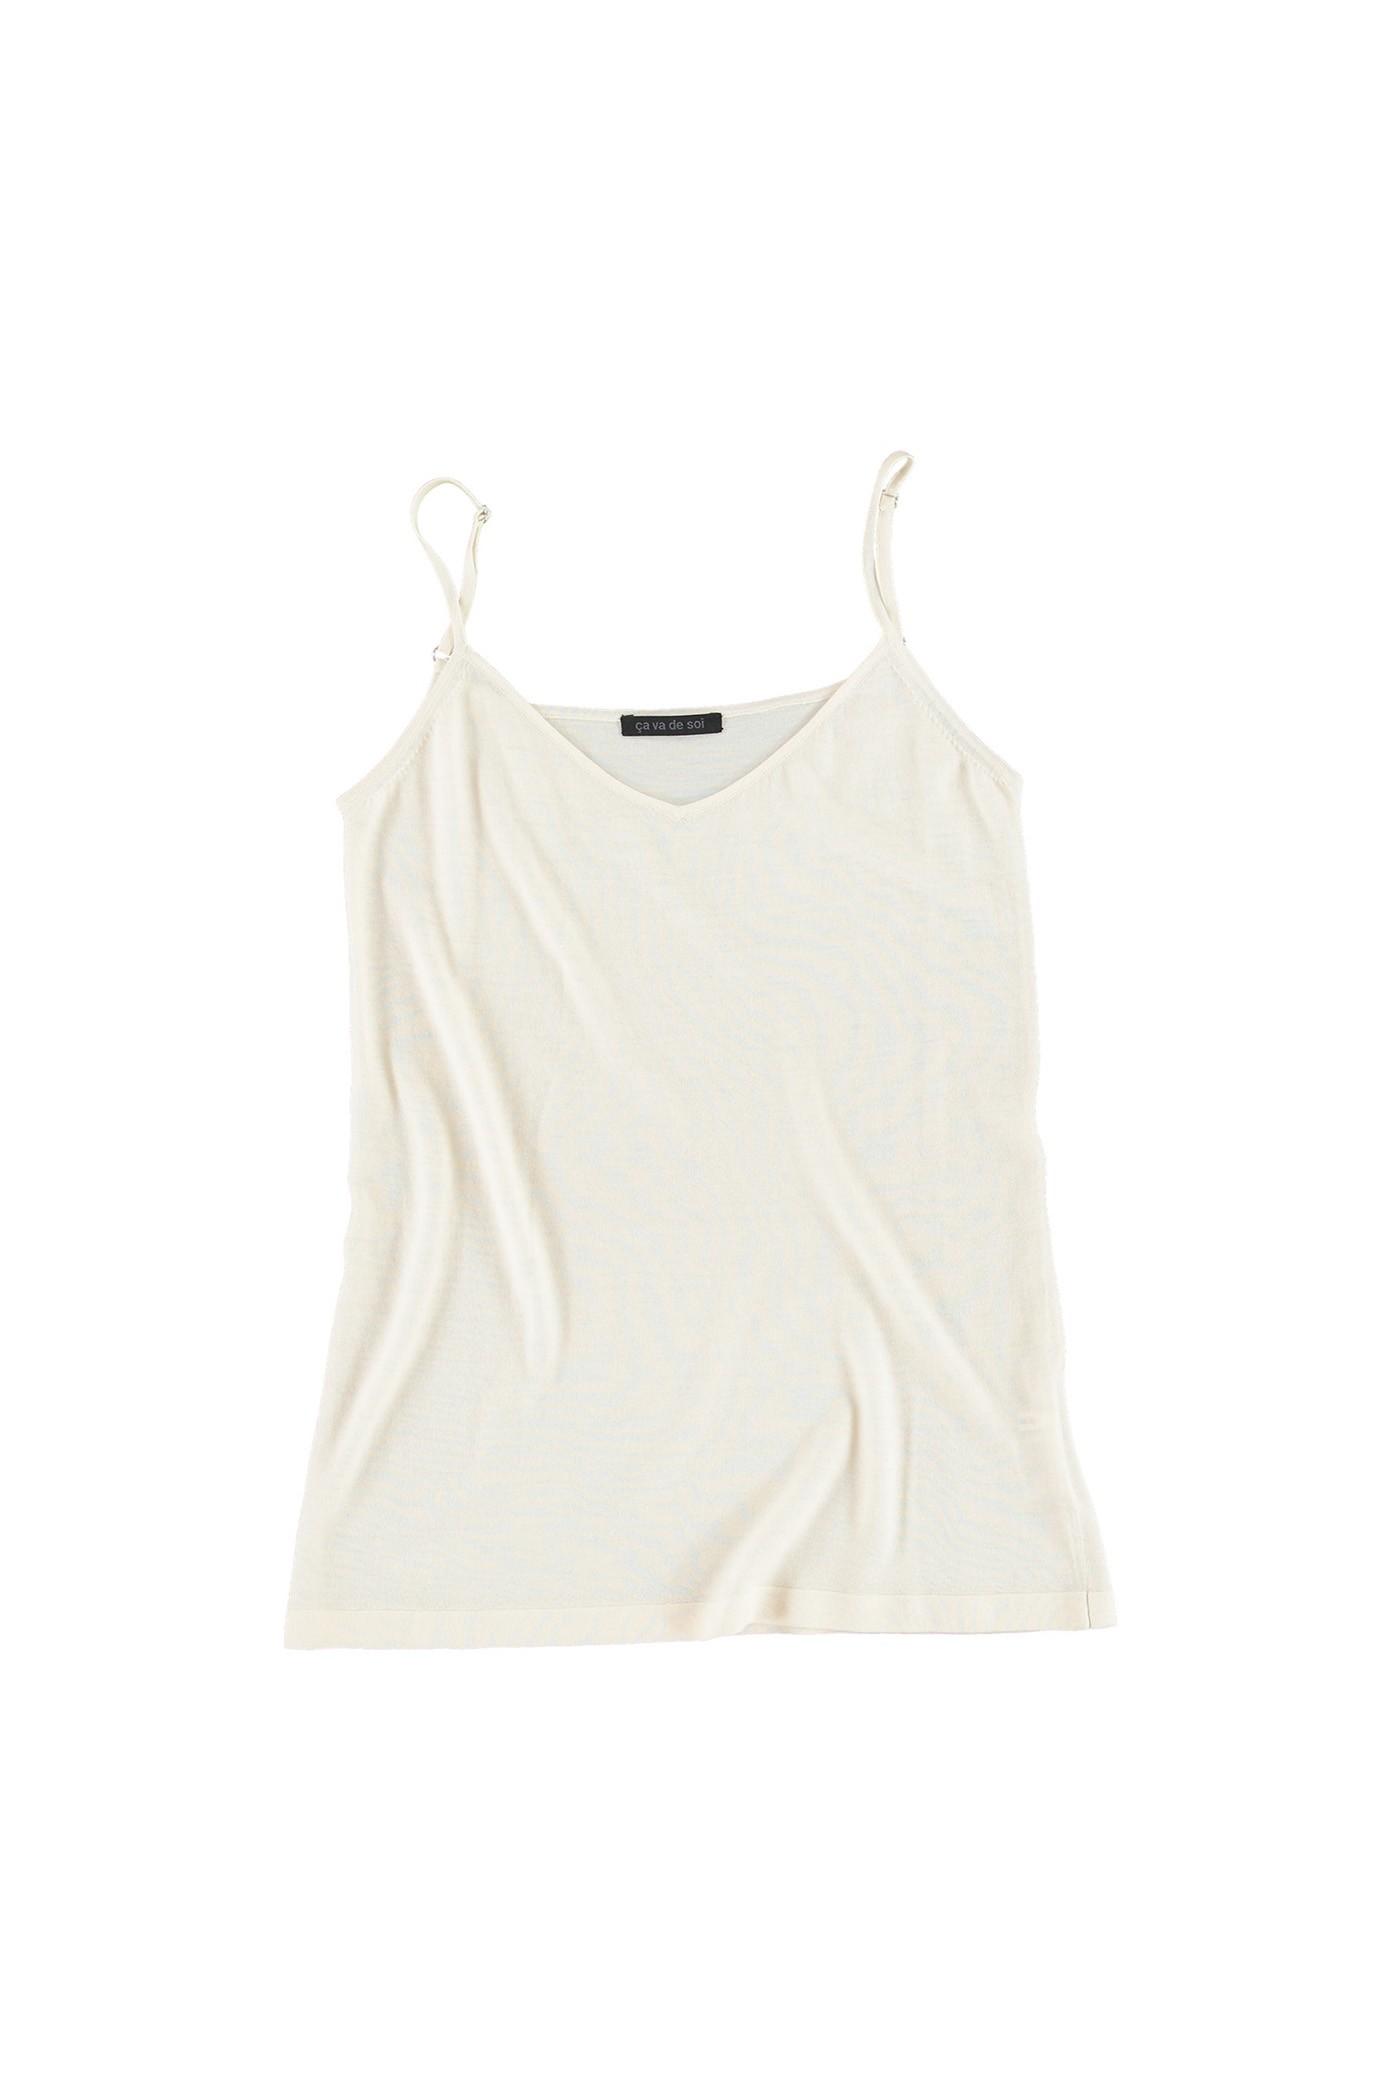 gilda-ivoire-2-f16-cavadesoi-knitwear.jpg